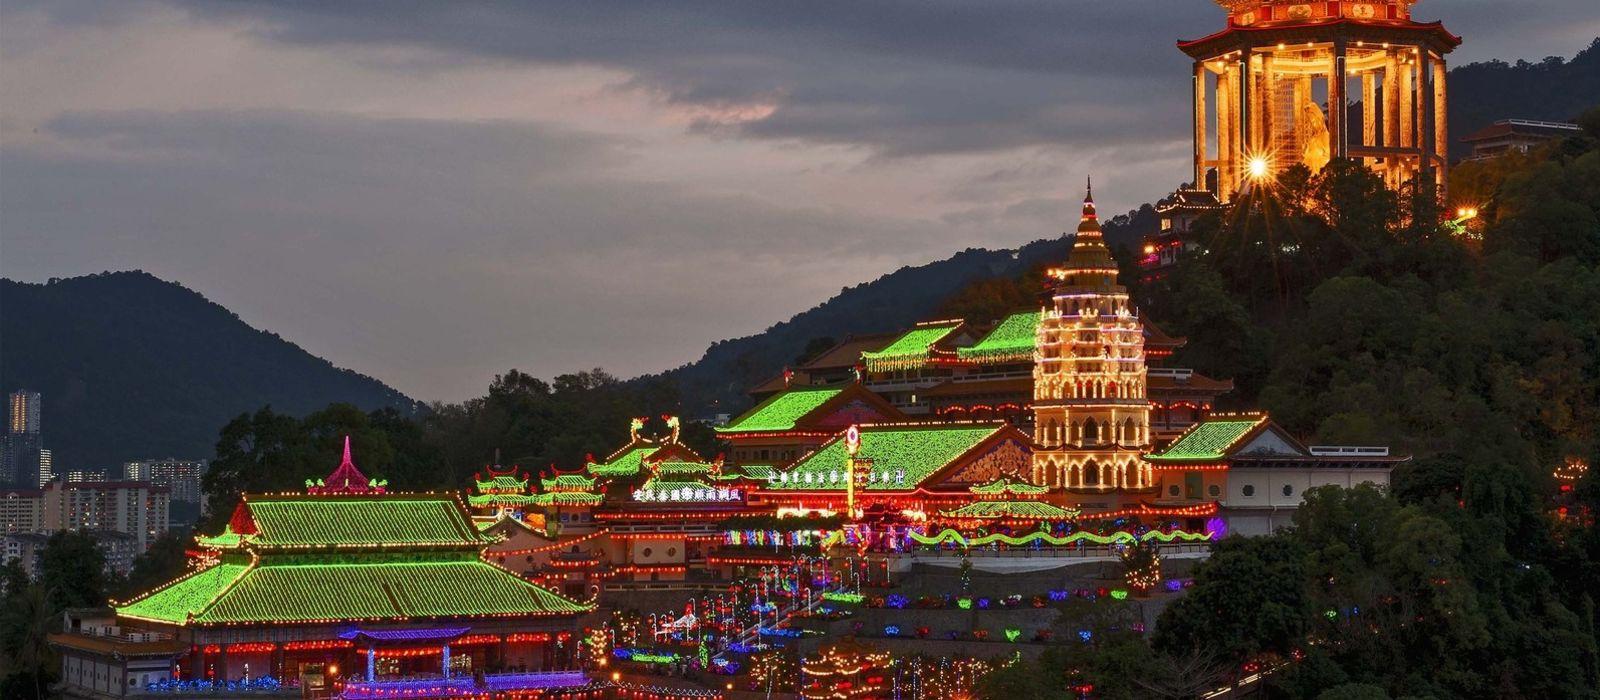 Mesmerizing Singapore and Malaysia Tour Trip 2